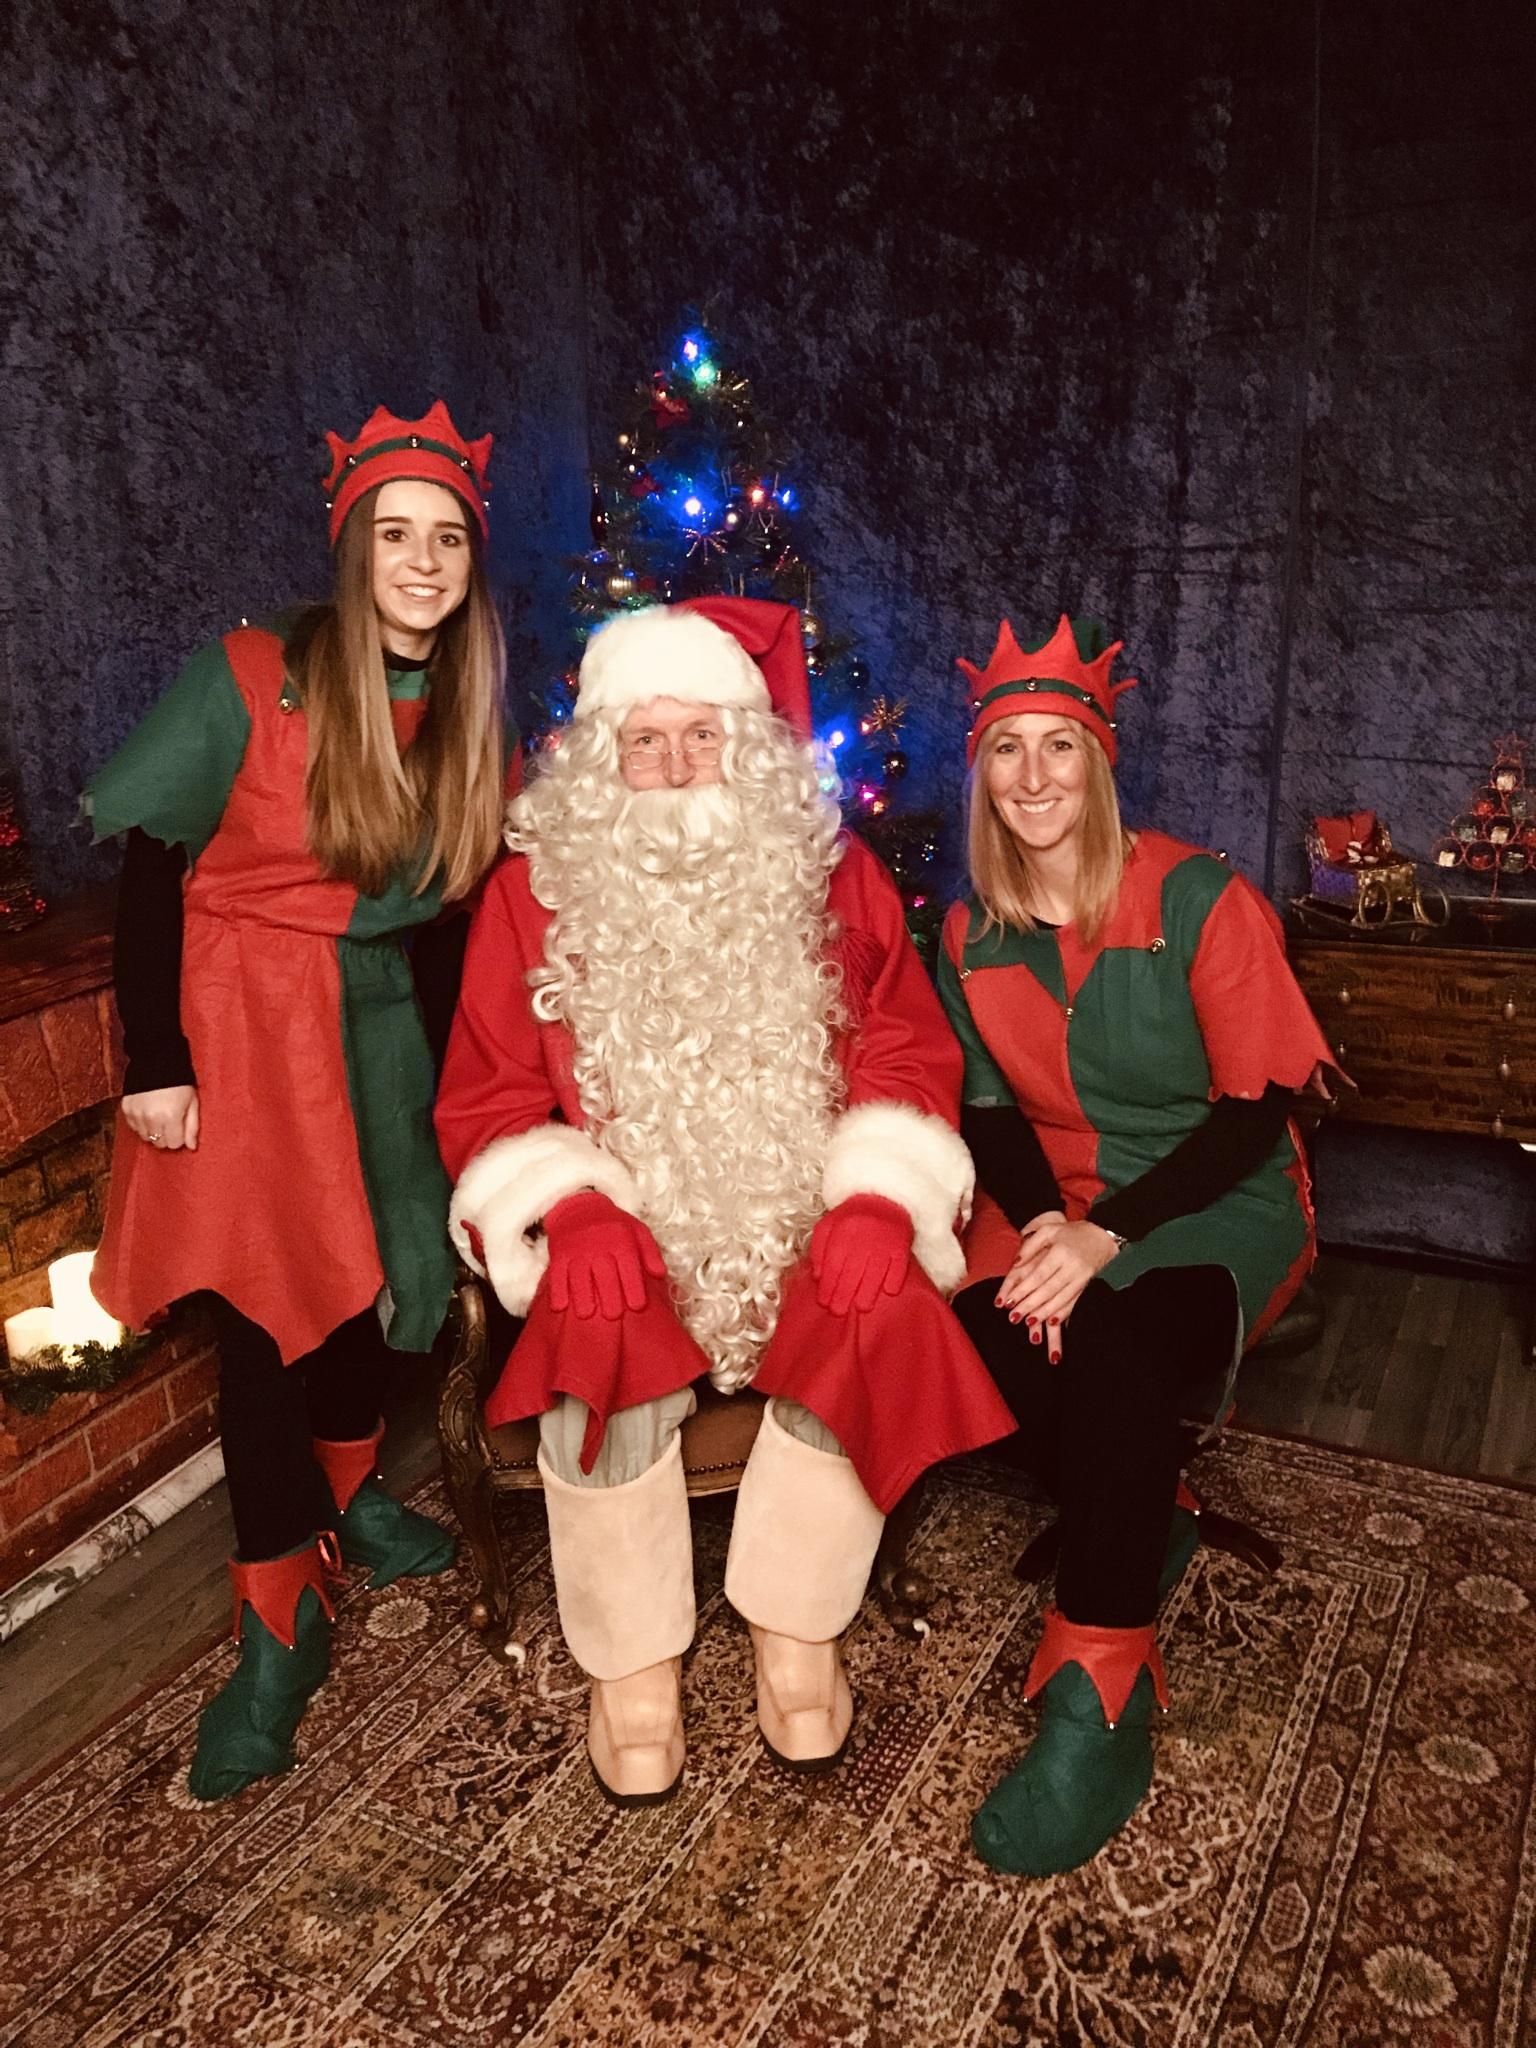 CLAN - Tendeka elves Gillian Fowler and Zoe Gove